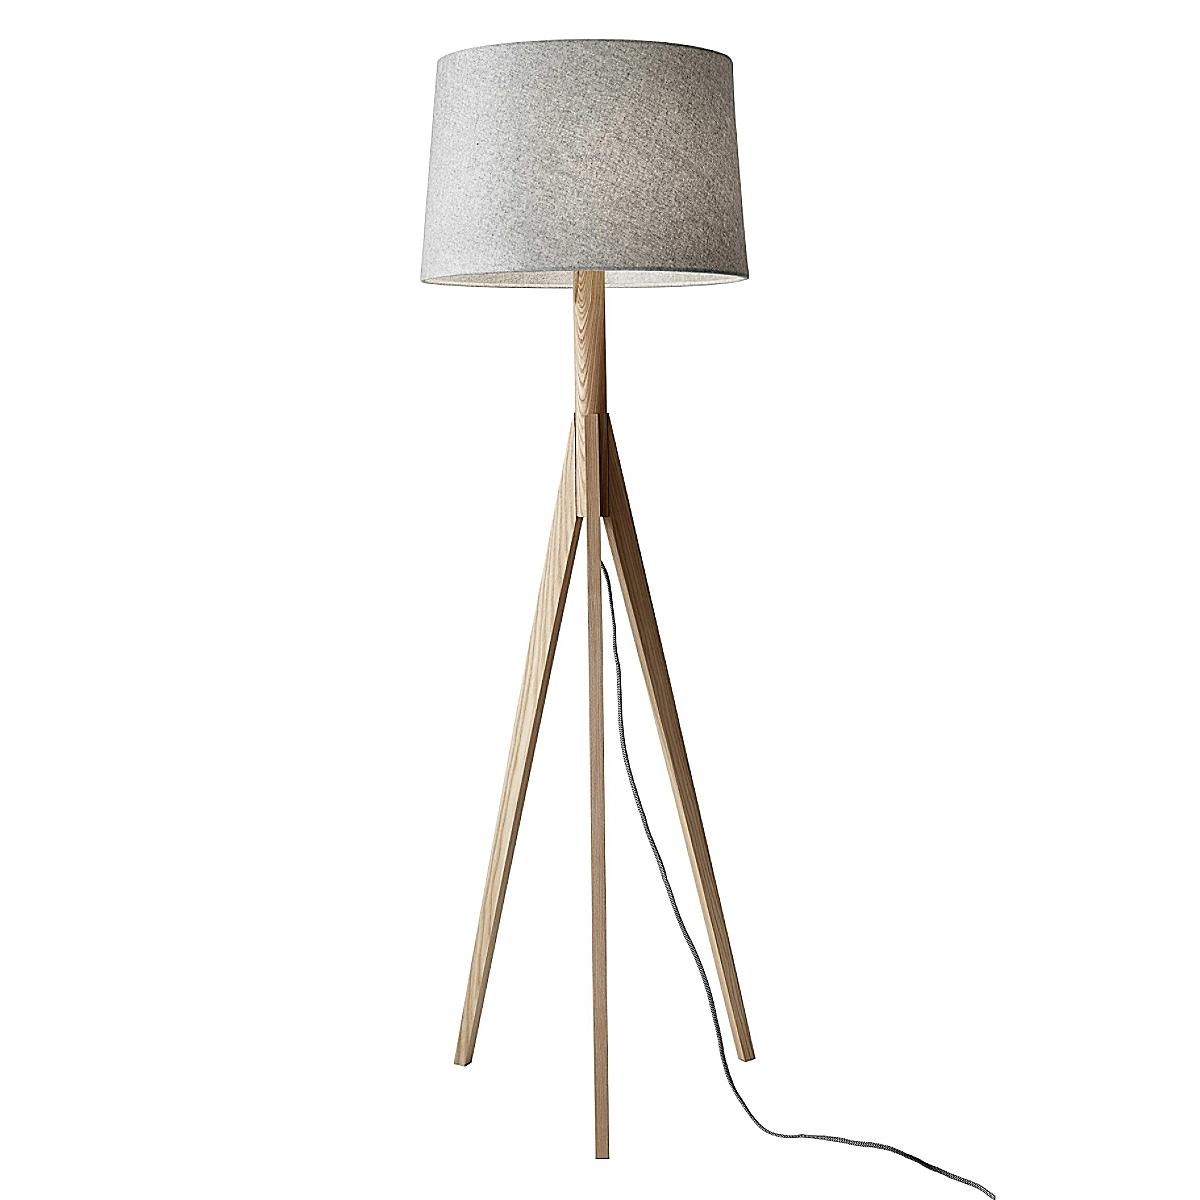 Modish Floor Lamp